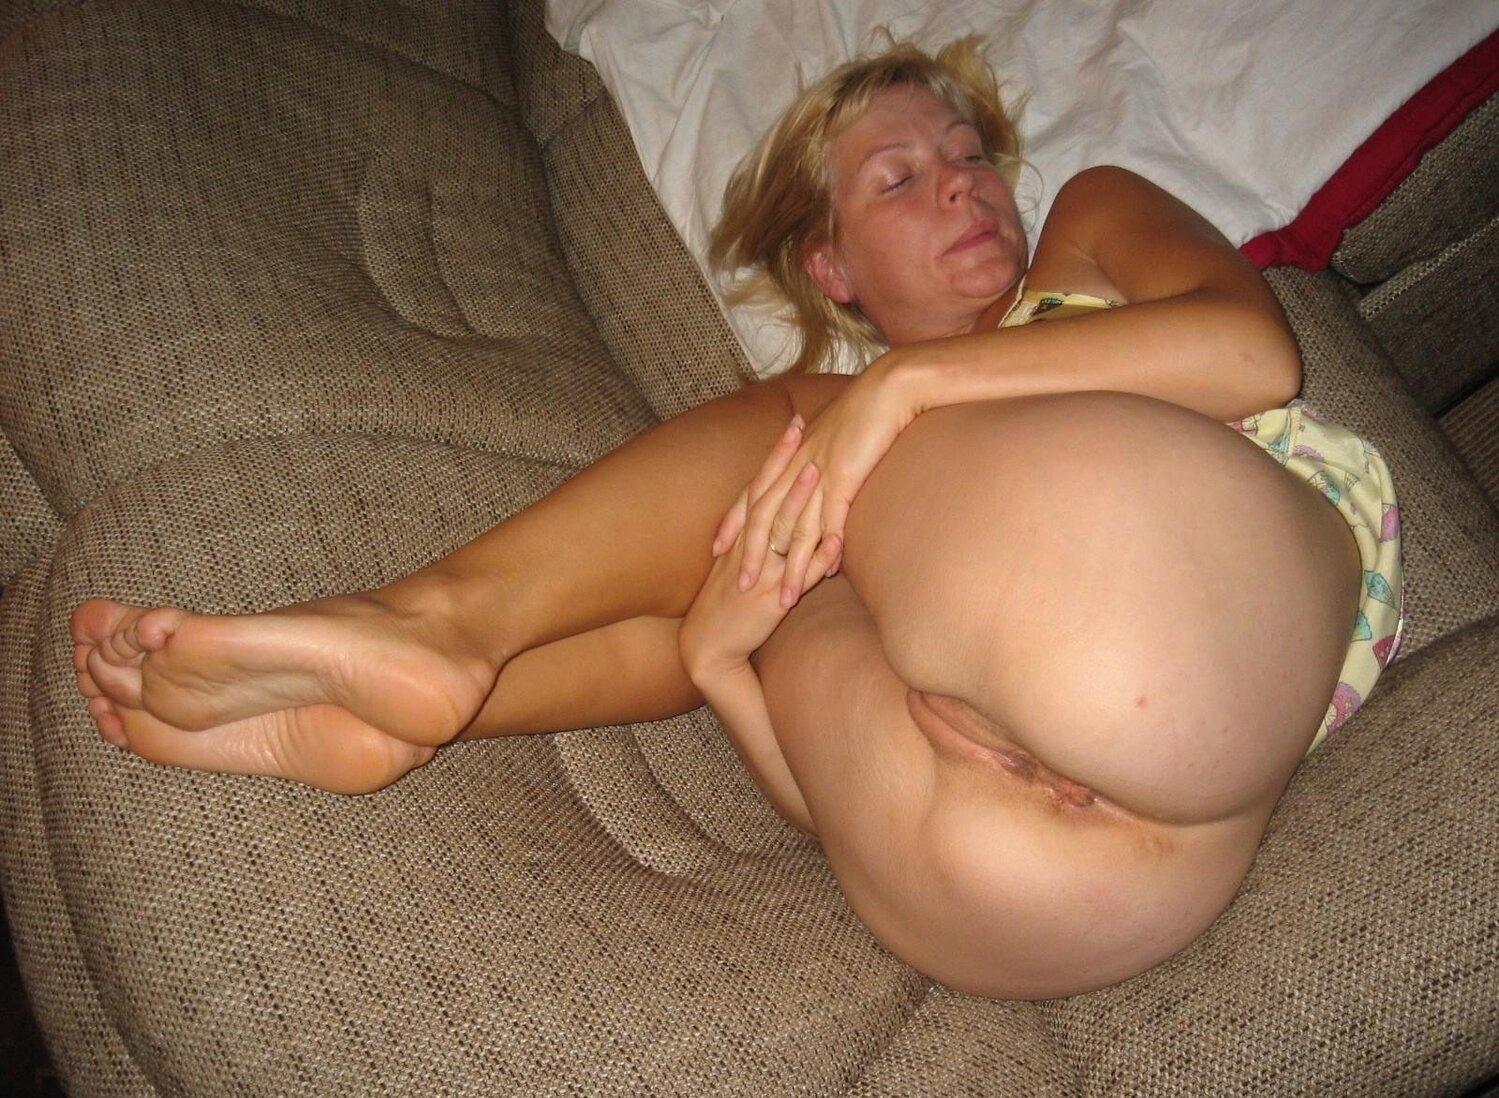 Тетки за 40 лежит поджав ноги на диване выпятив жопу.